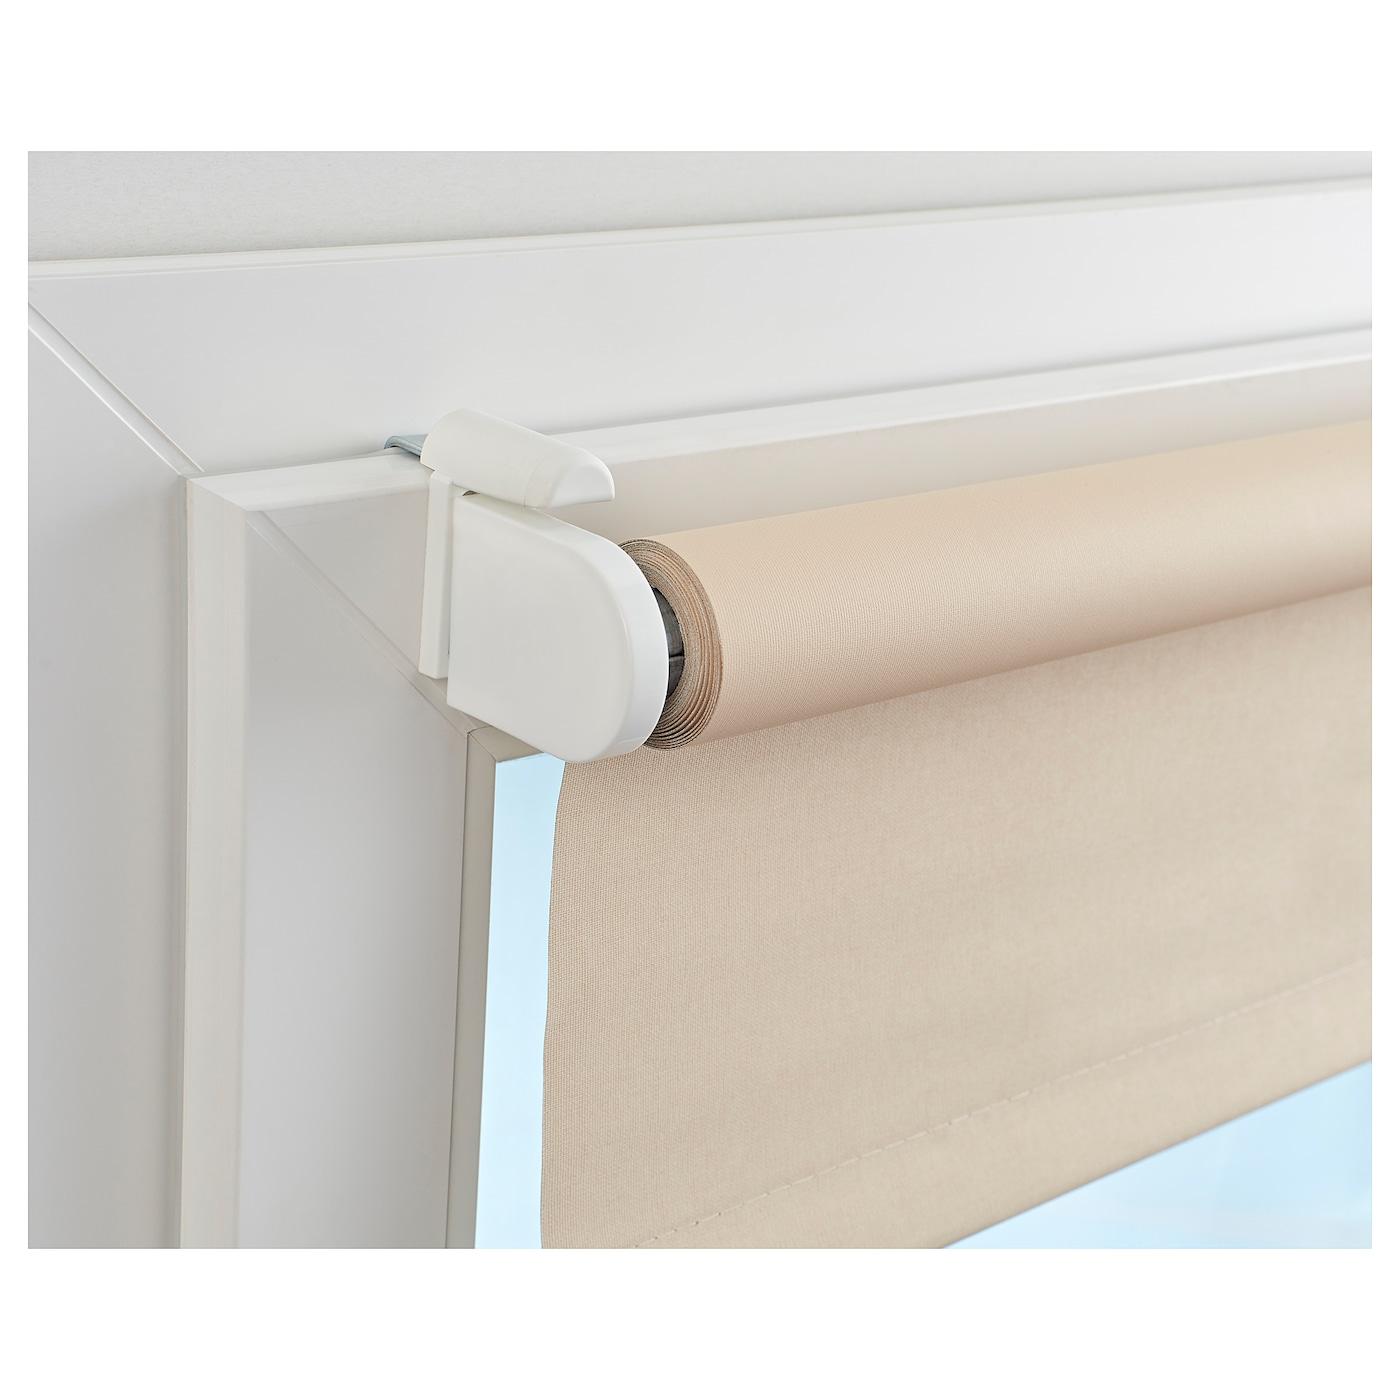 klamby fixations pour stores blanc ikea. Black Bedroom Furniture Sets. Home Design Ideas